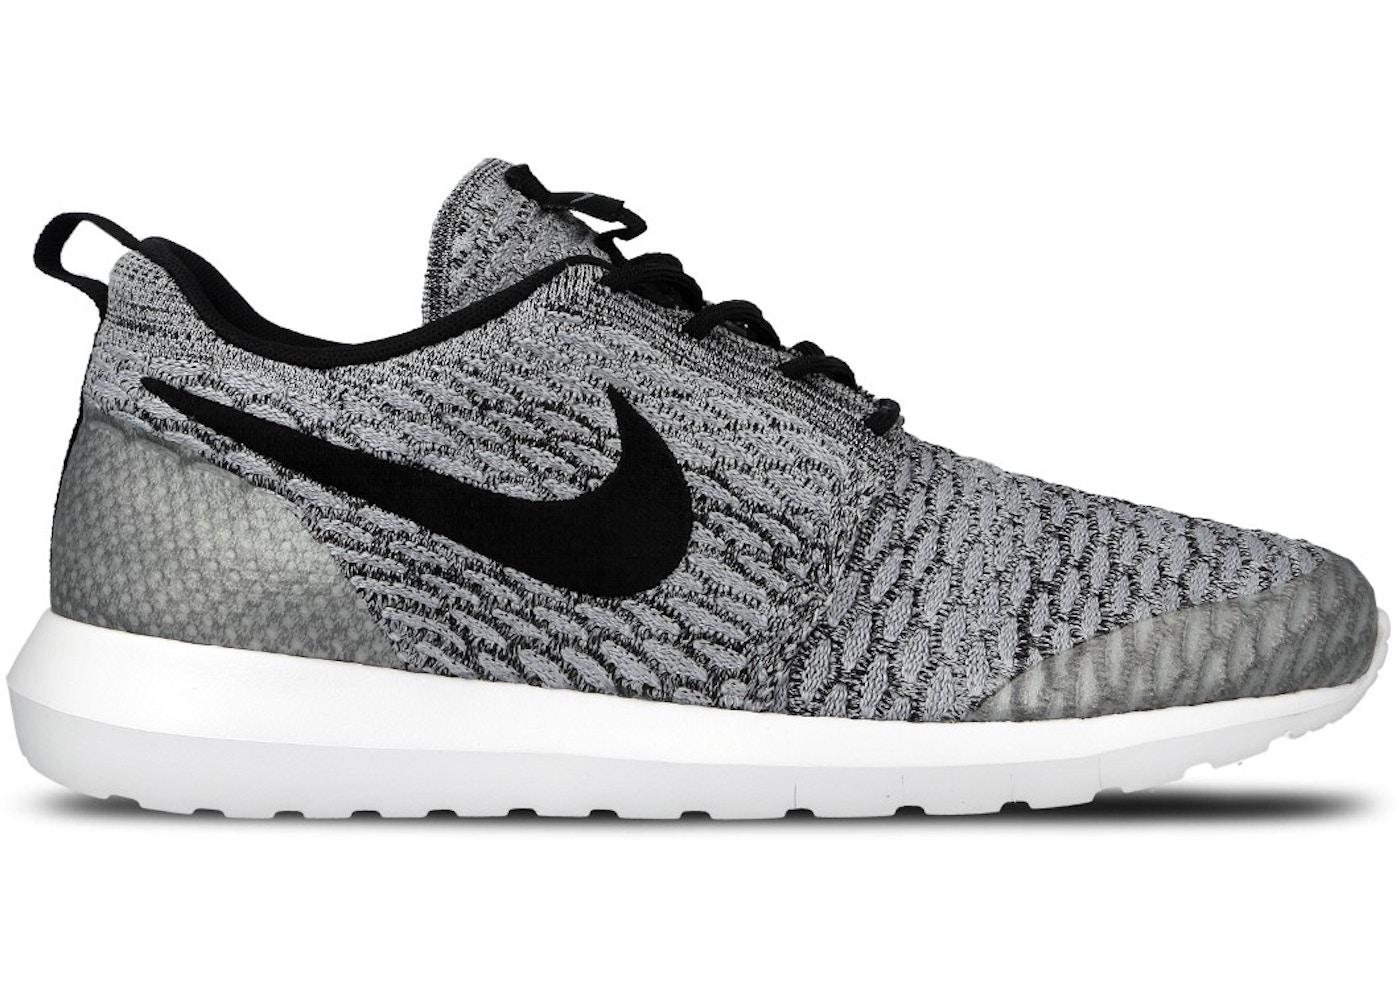 Nike Roshe Run Flyknit NM Wolf Grey - 816531-002